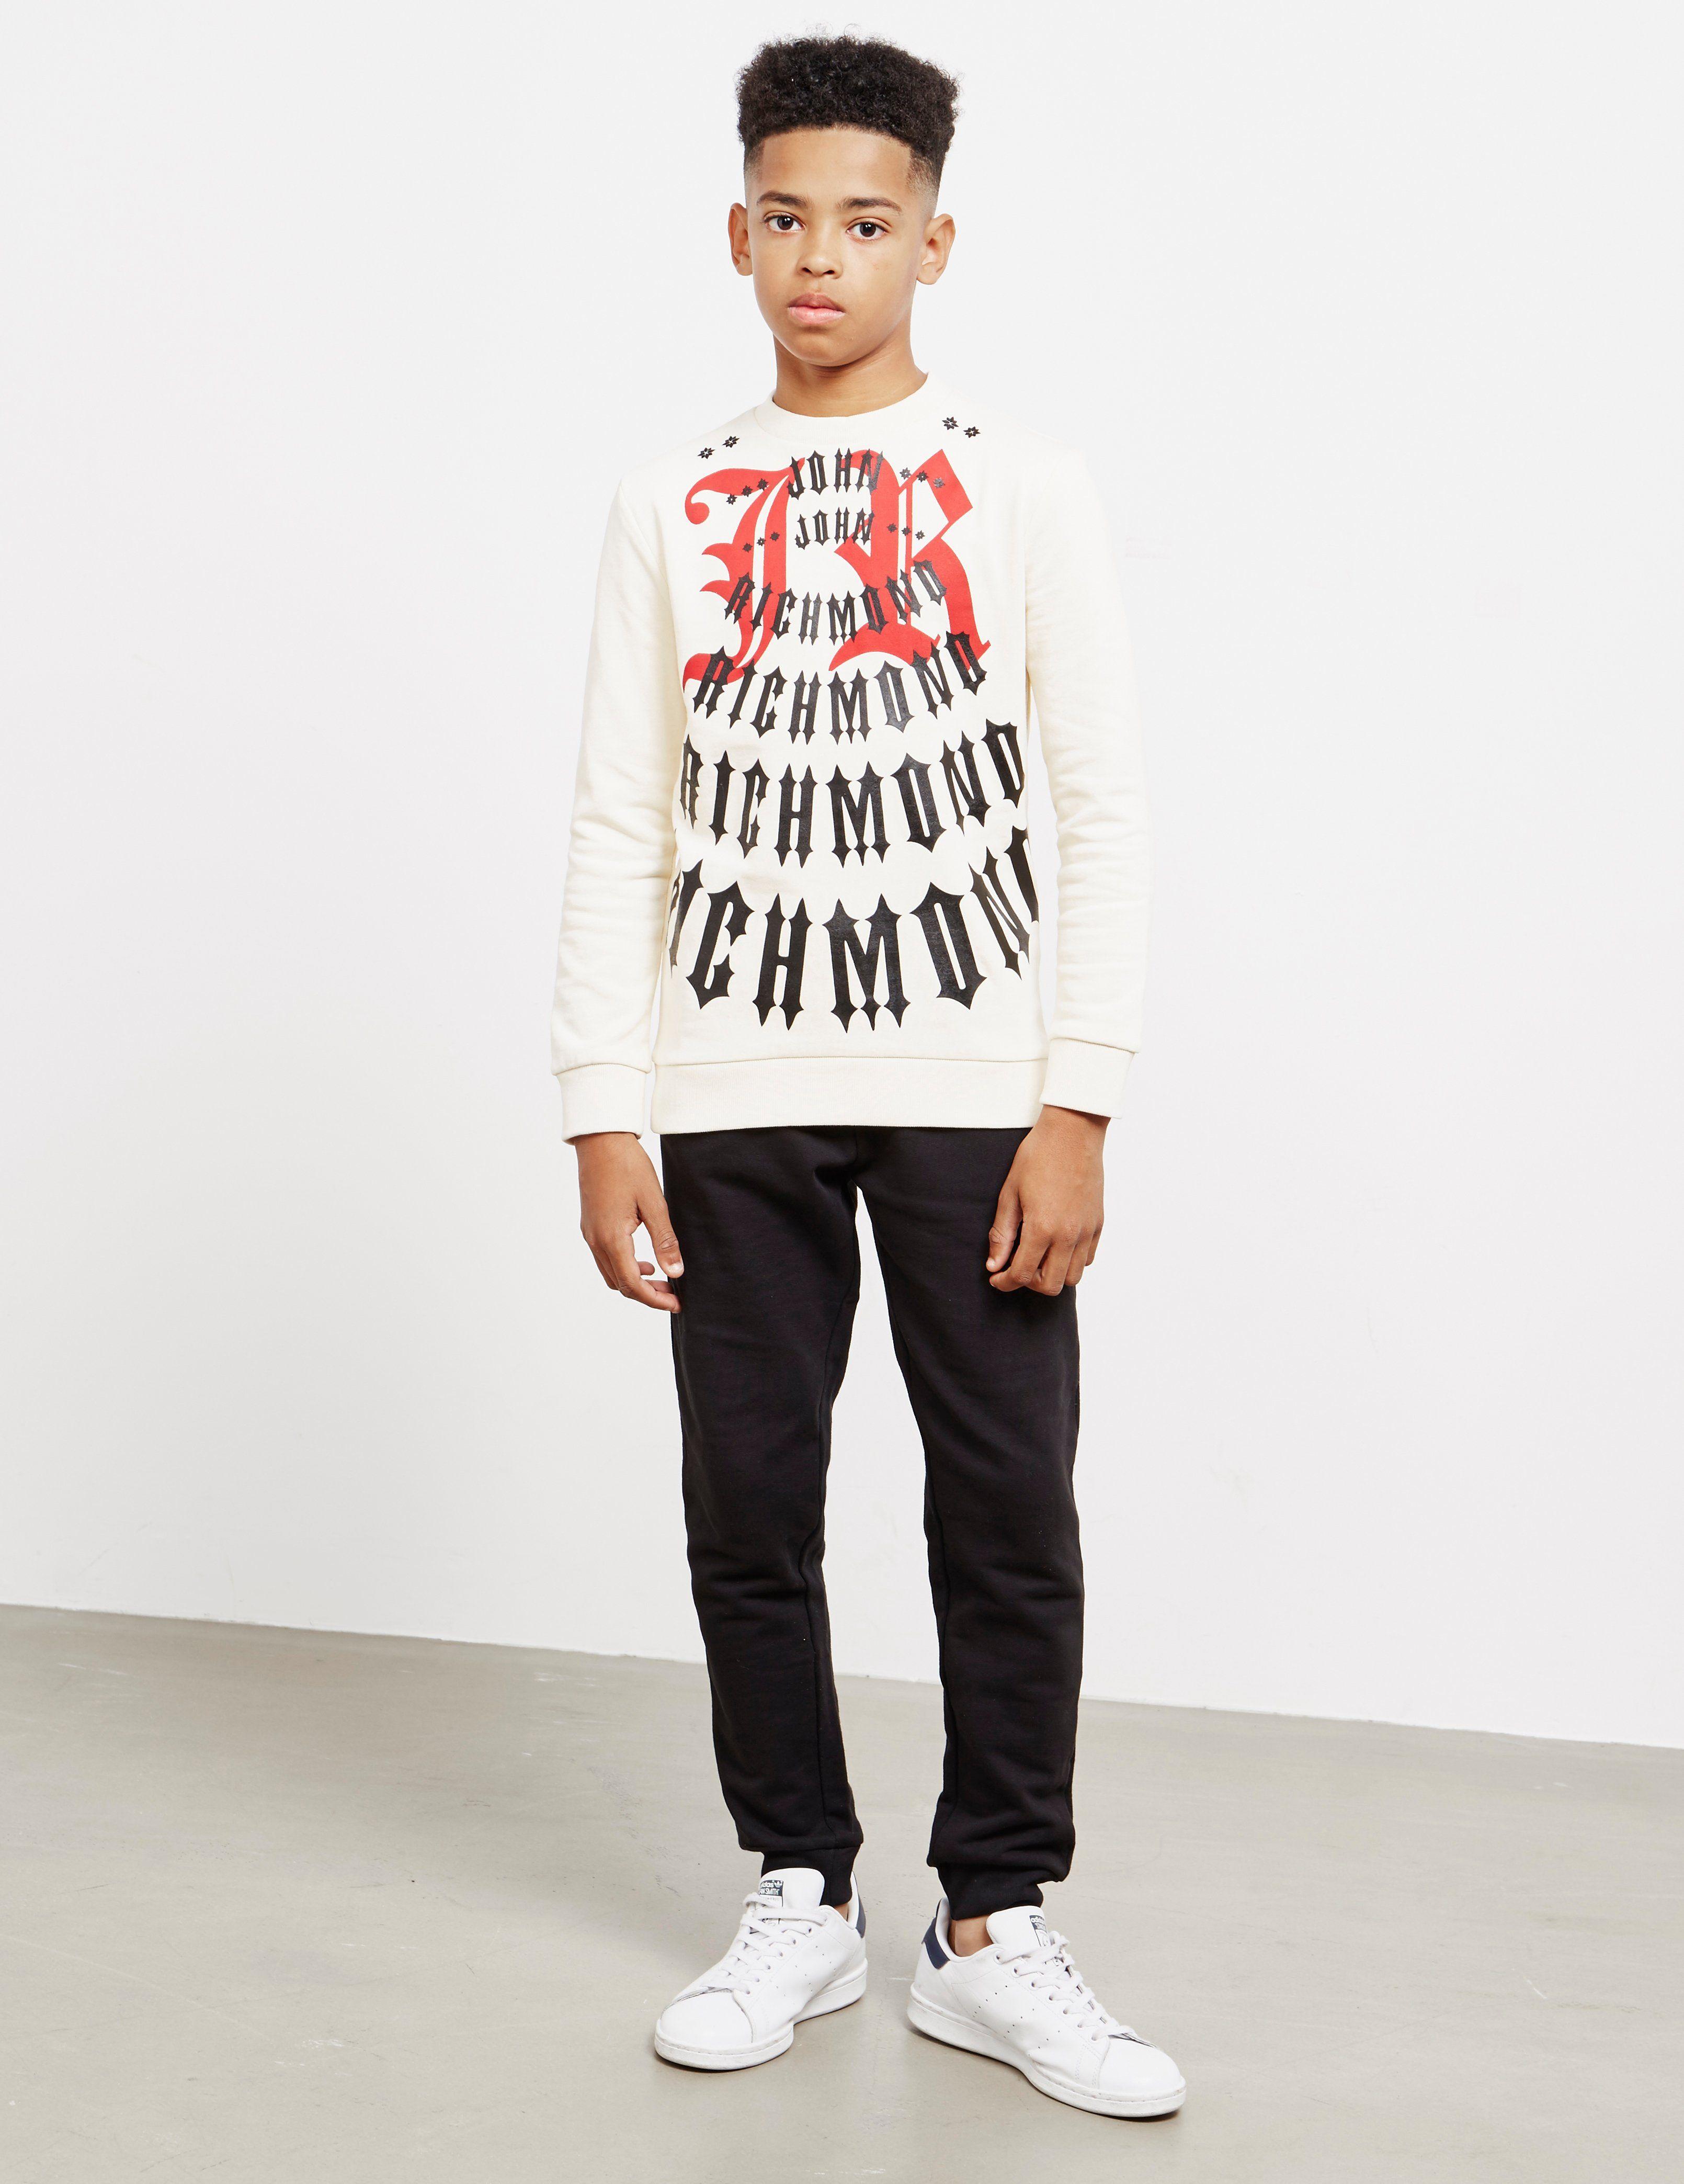 John Richmond Multi Logo Sweatshirt - Online Exclusive